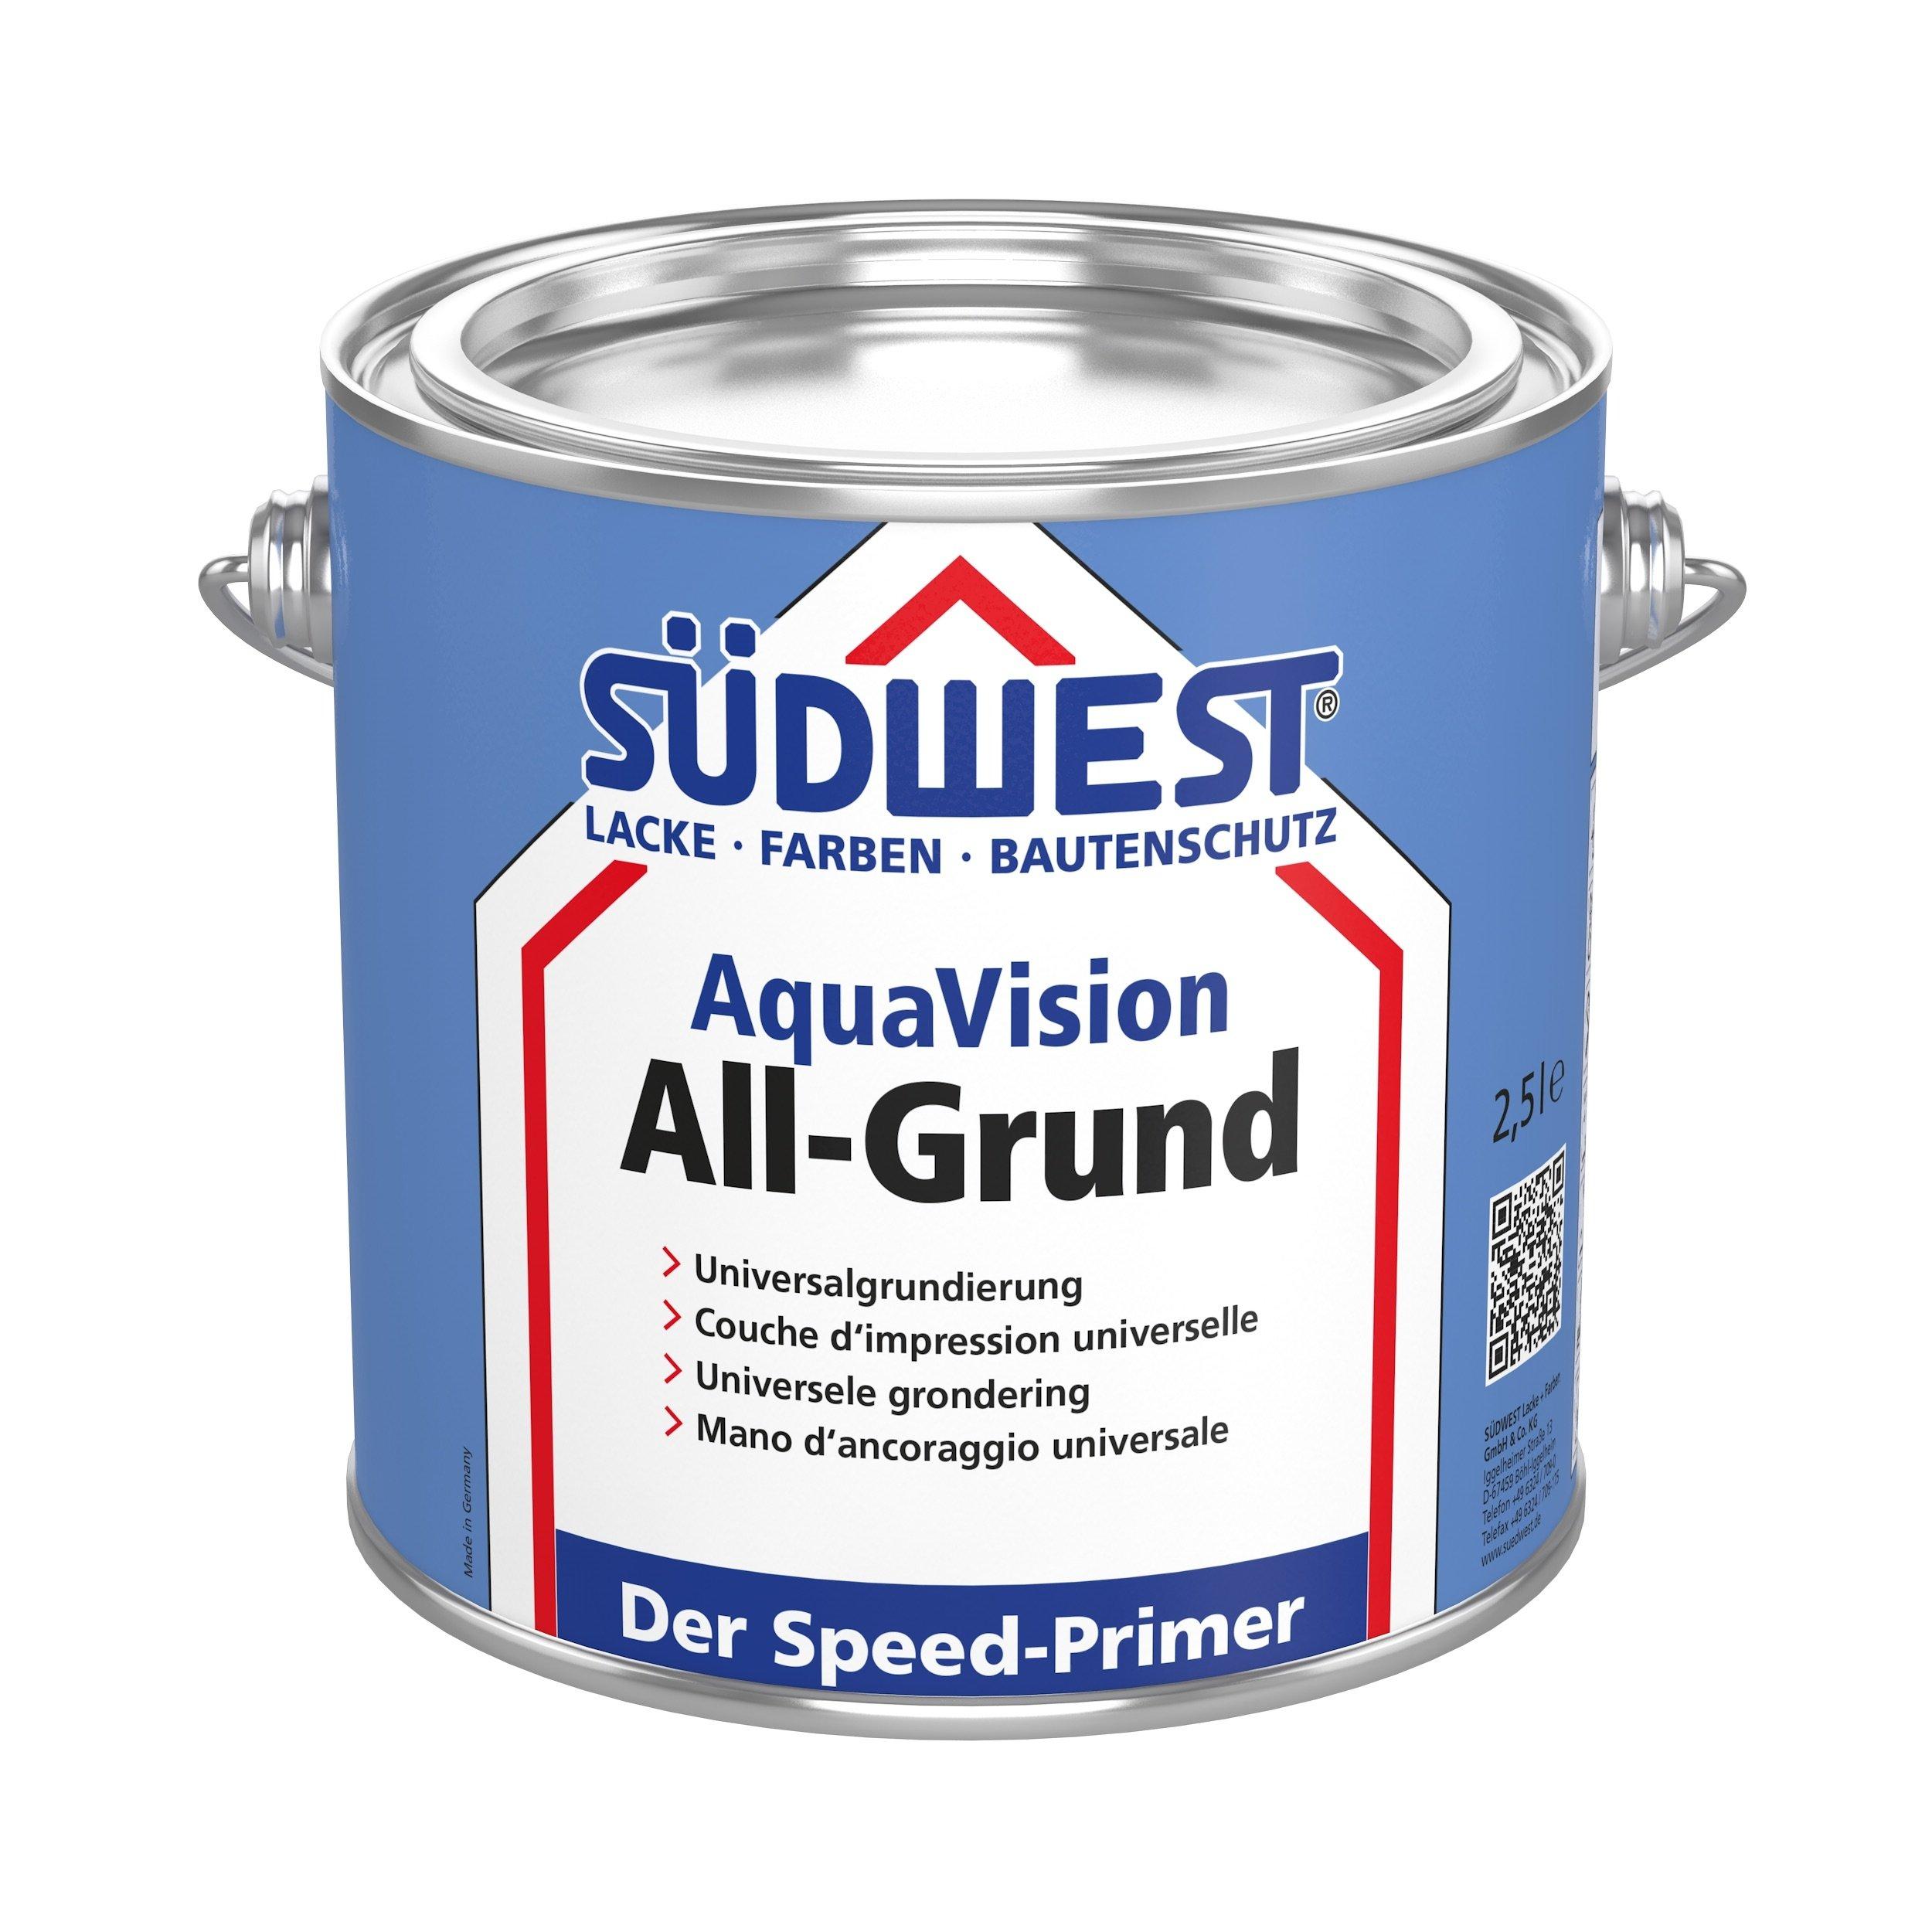 AquaVision All-Grund hvid 0,375 L